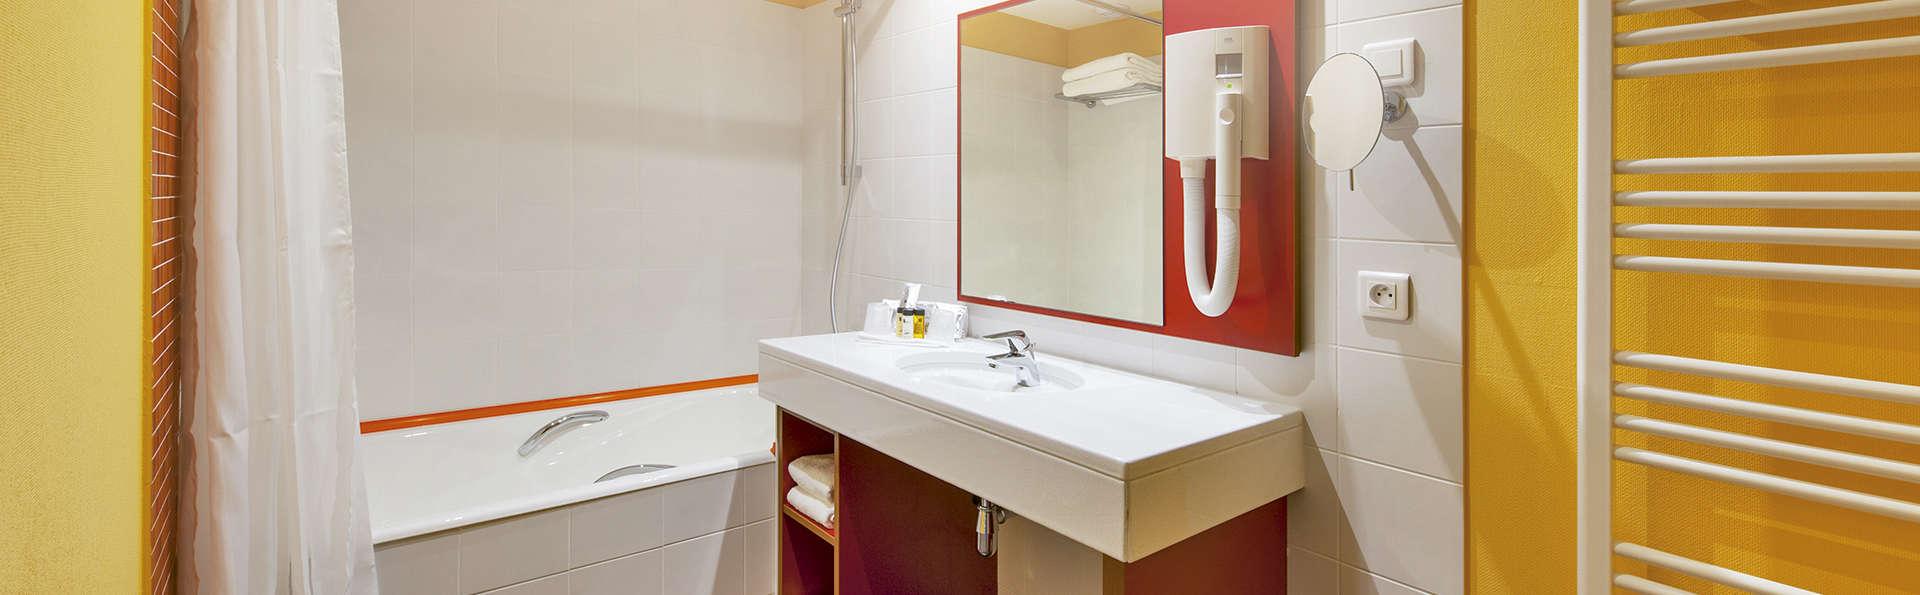 Hôtel Lyon Métropole & Spa - edit_bathroom4.jpg